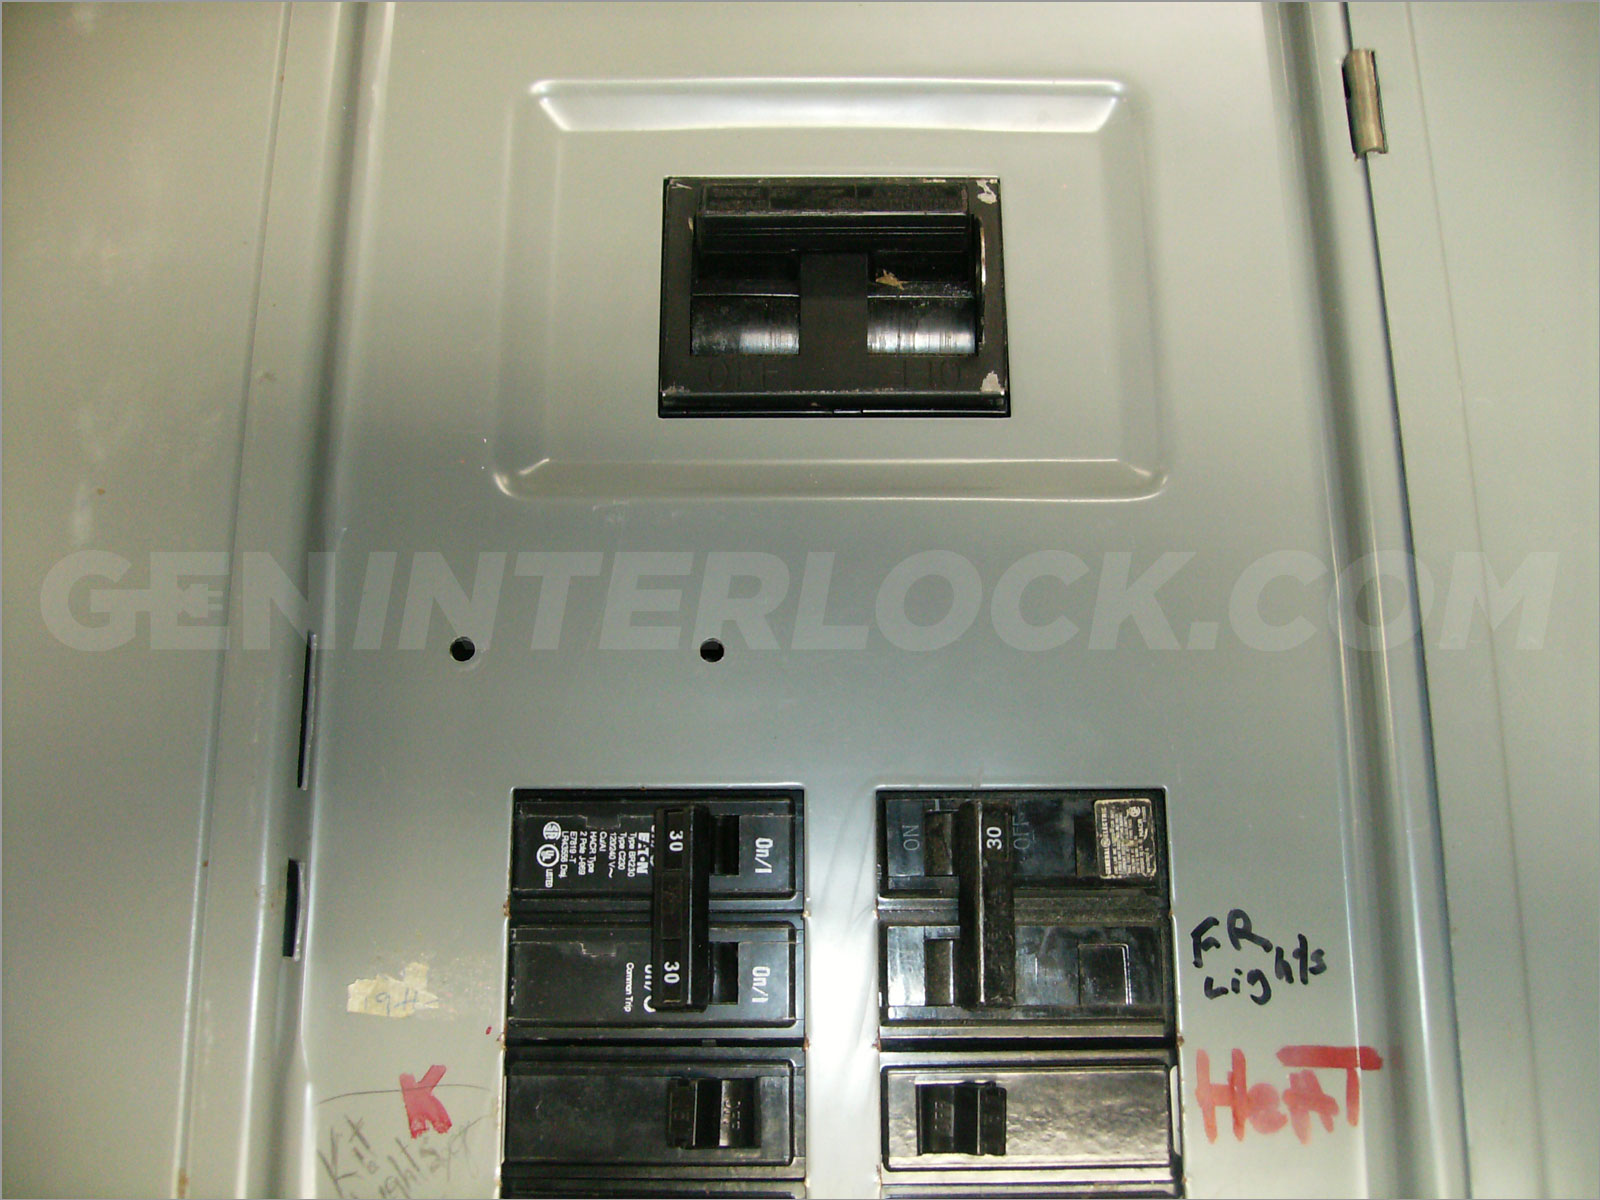 Generator interlock kit GTE Sylvania 150200 Amp Panel Transfer – Interlock Kit Wiring Diagram